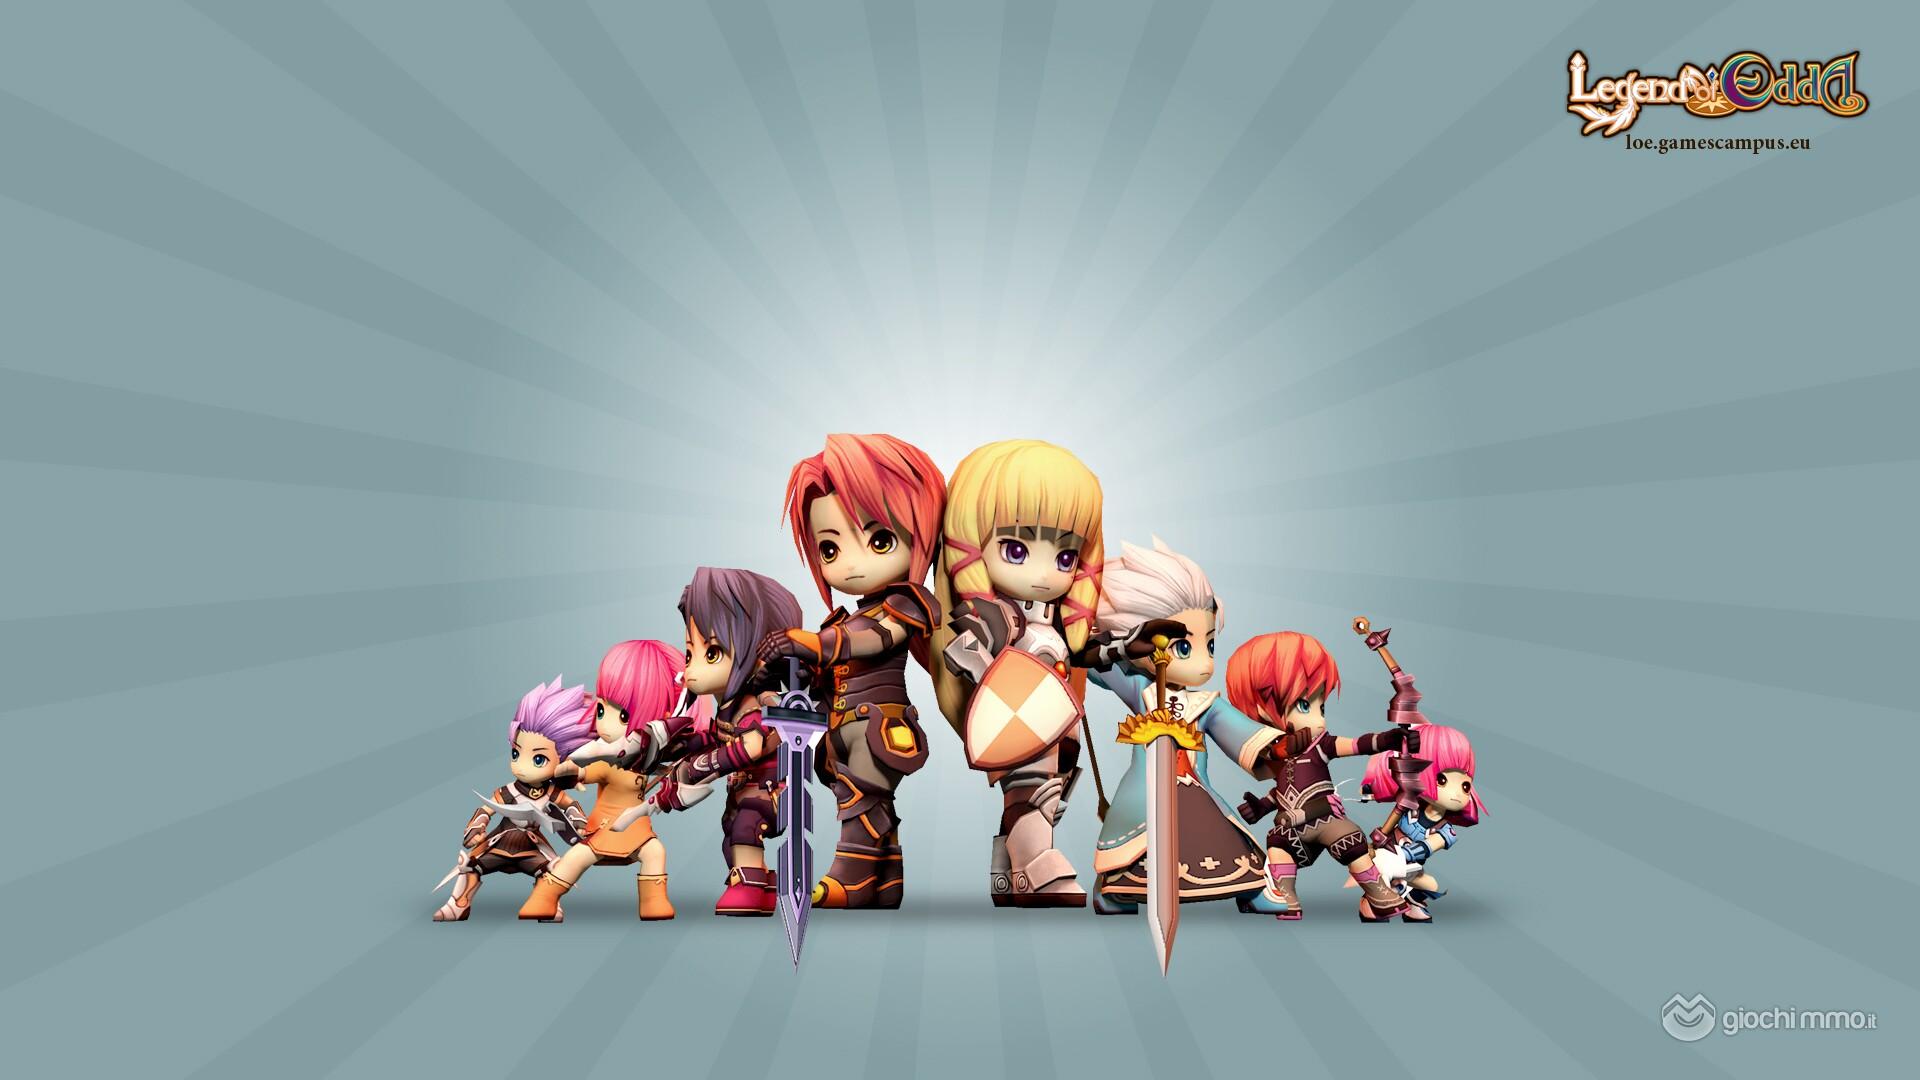 Clicca sull'immagine per ingrandirlaNome: Legend of edda screen1.jpgVisite: 55Dimensione: 211.5 KBID: 8531